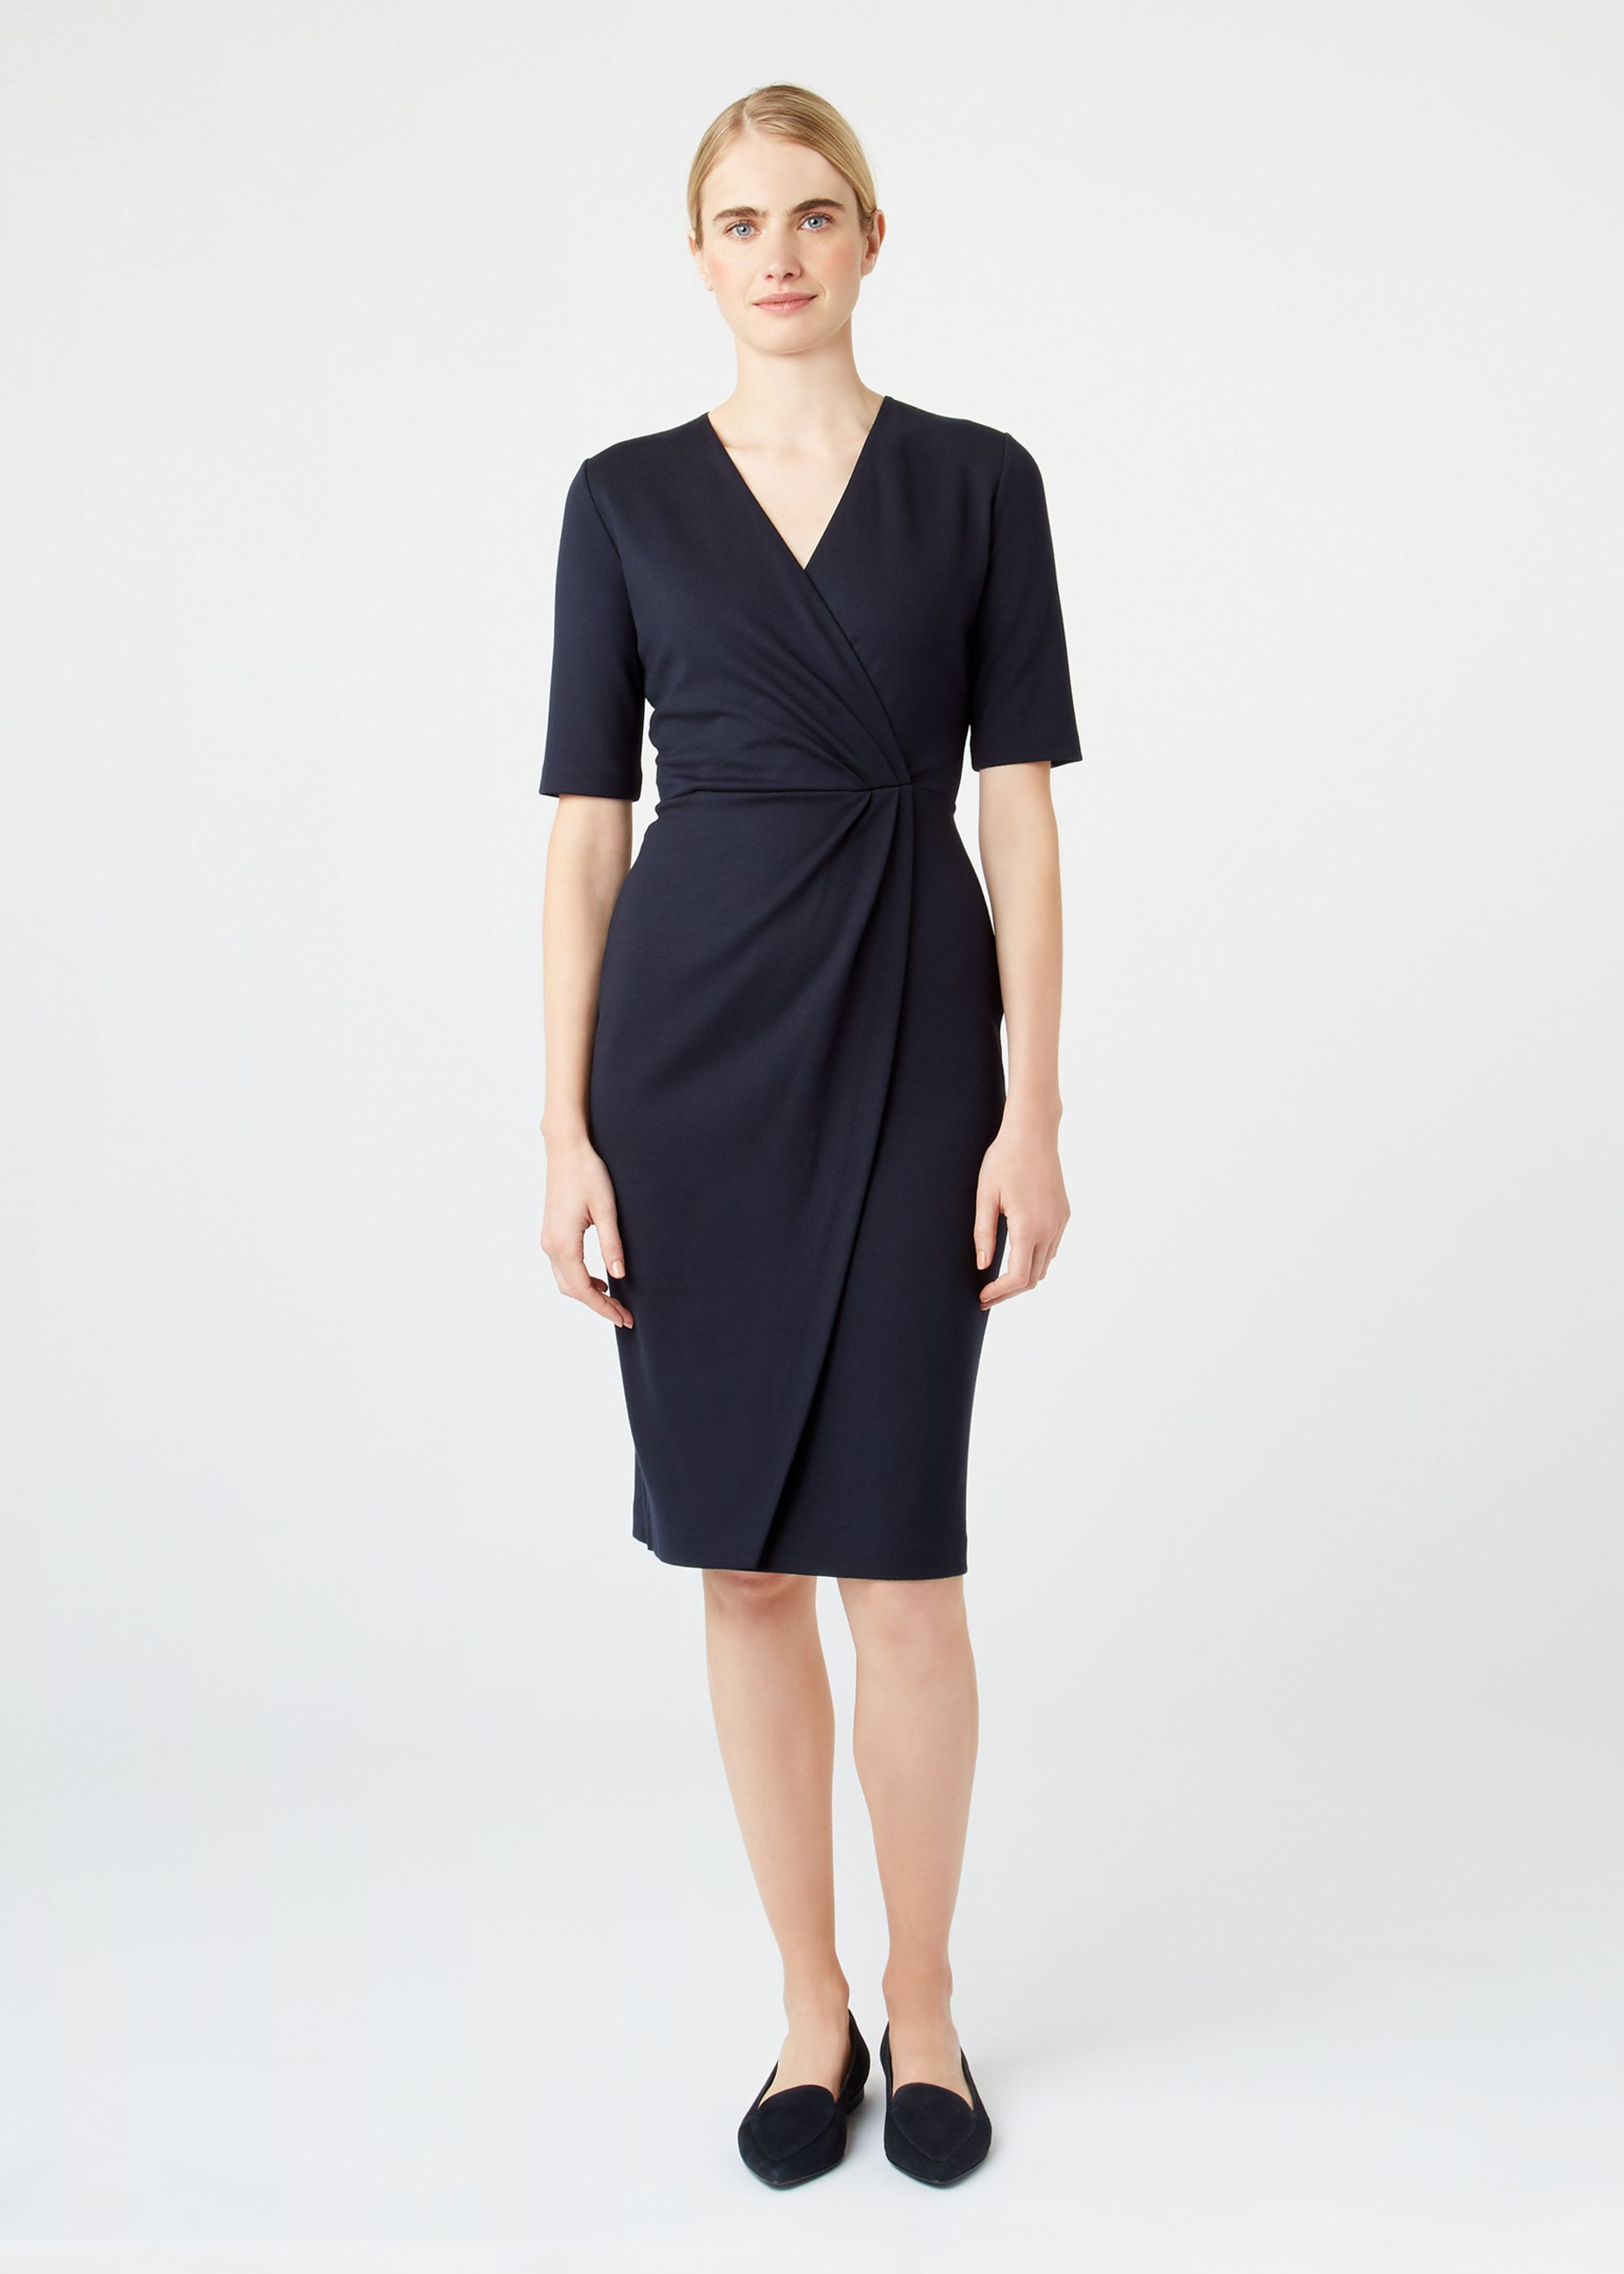 Olive Dress,Olive Dress,Olive Dress,Olive Dress,olive dress,